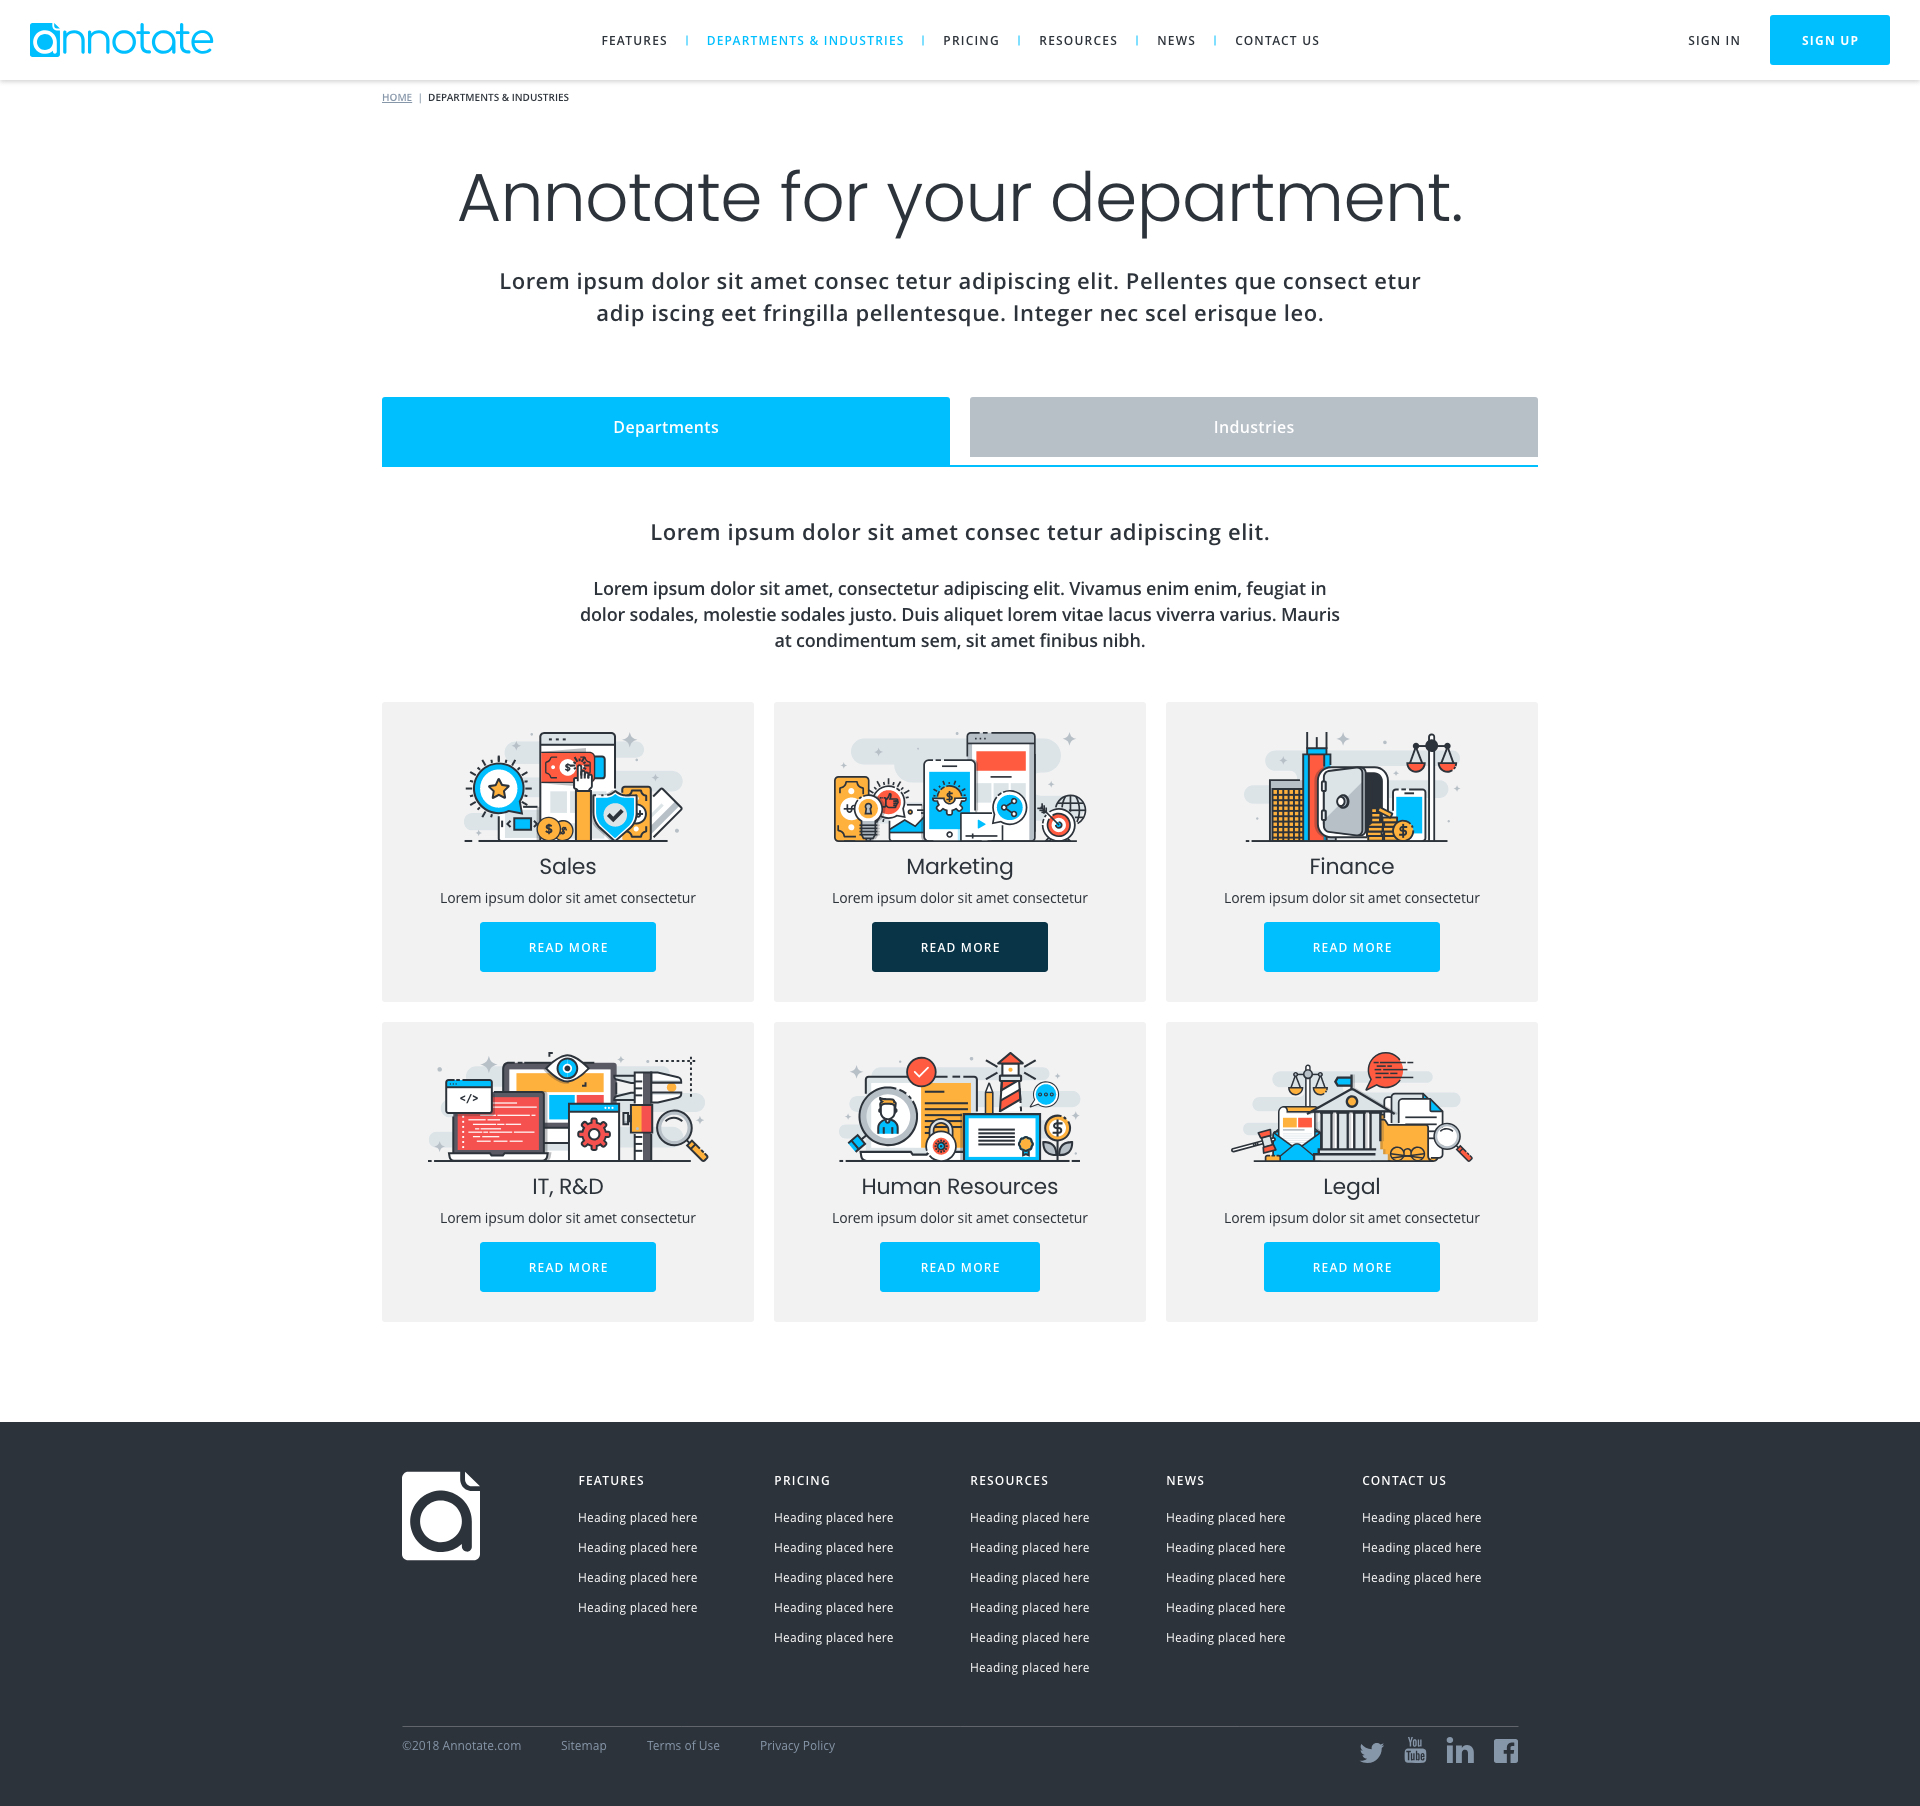 Annotate Departments & Industries.jpg